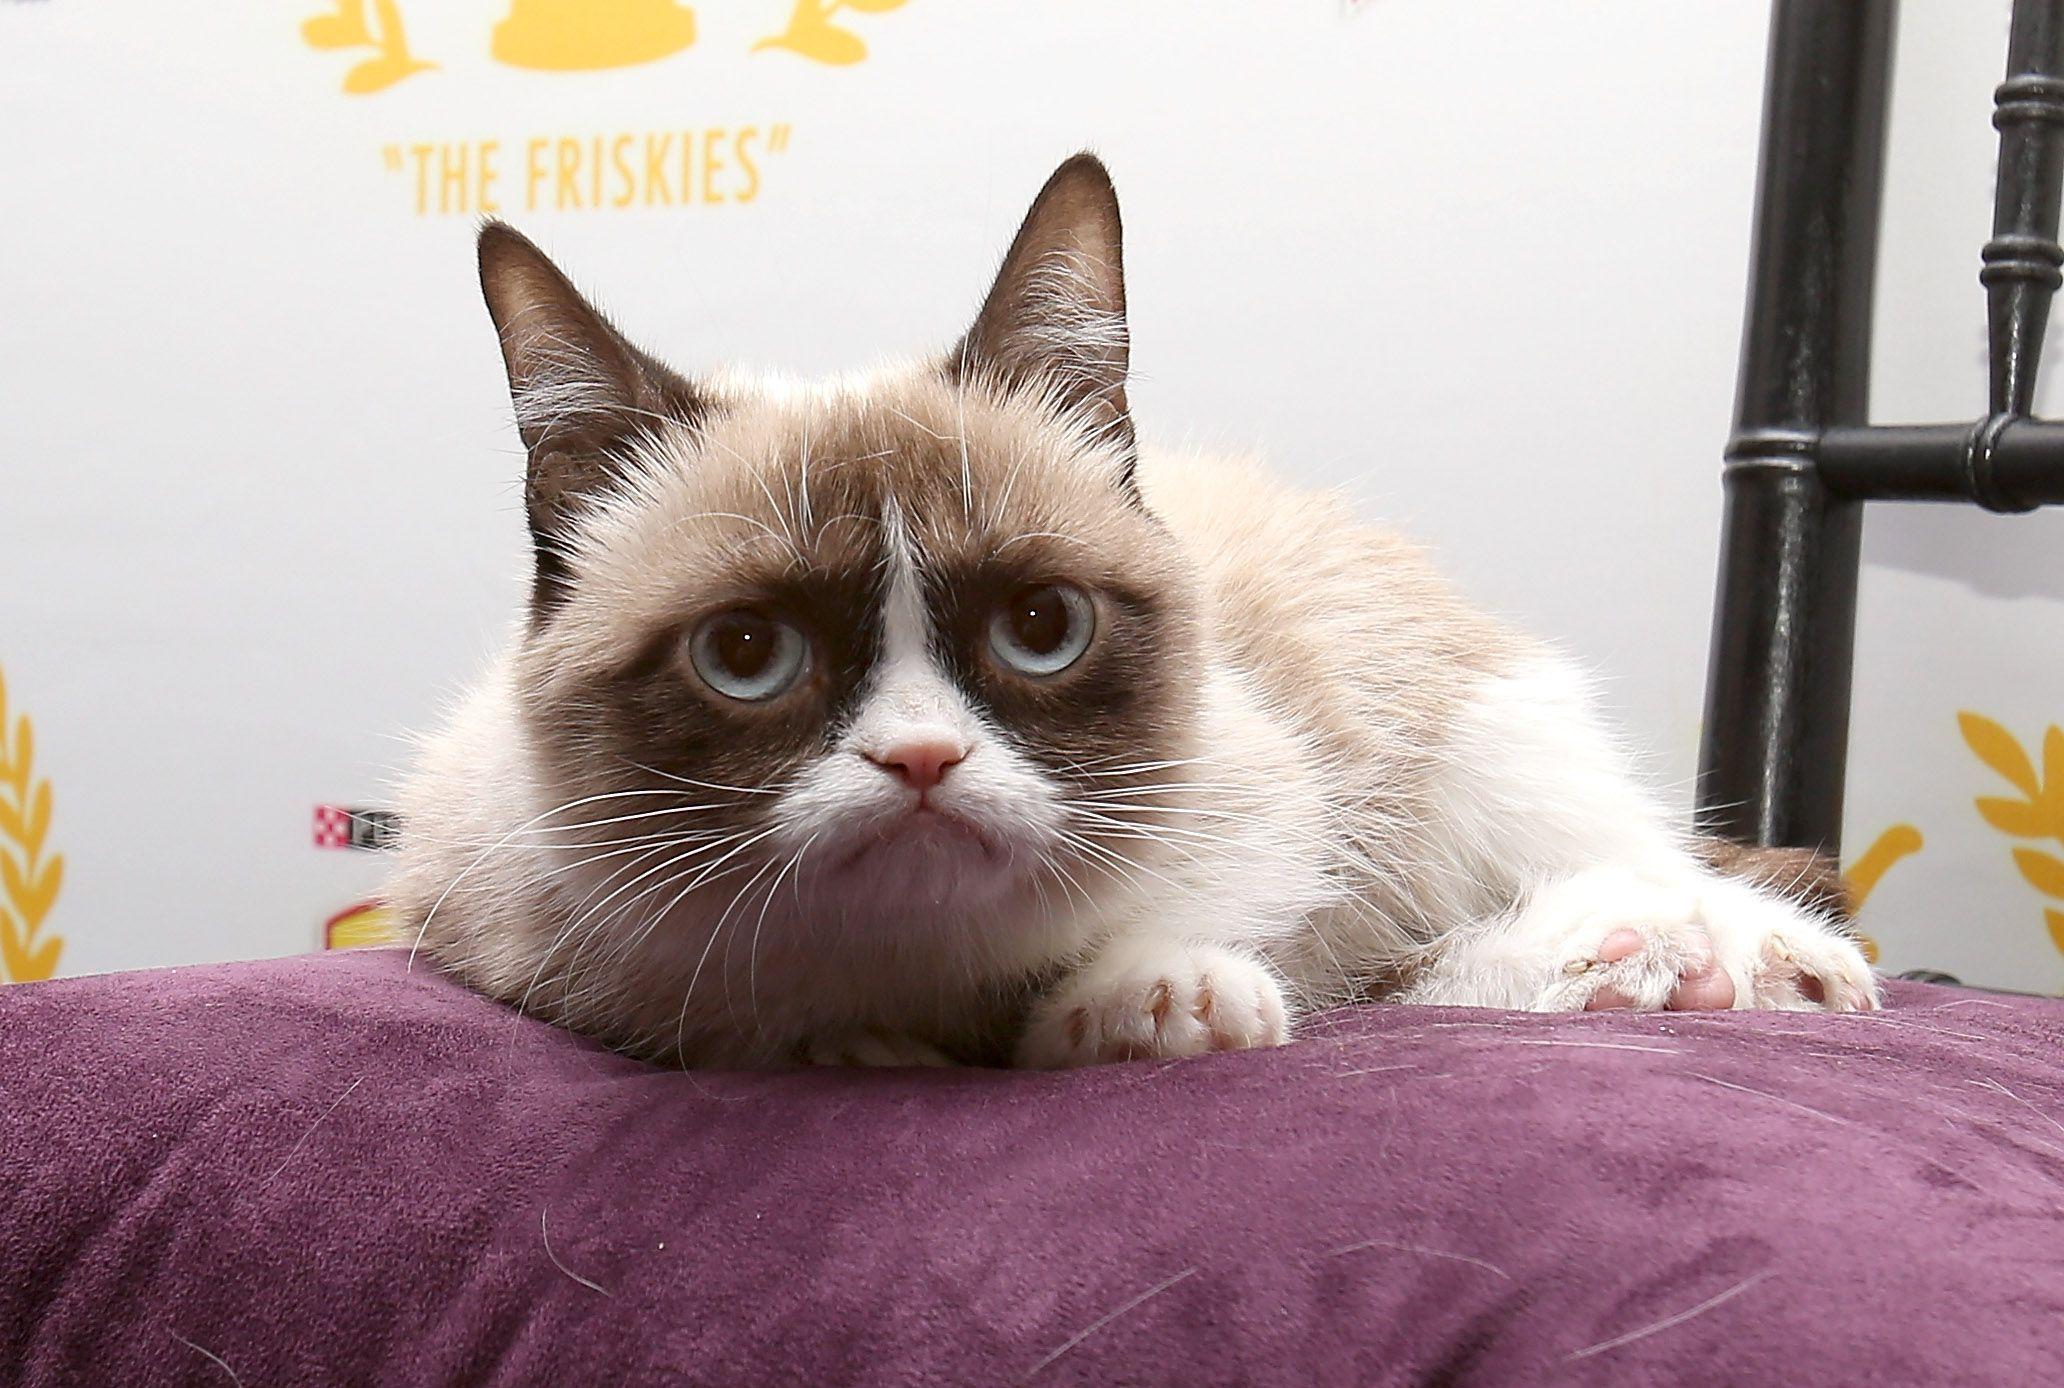 15 Facts About Grumpy Cat Grumpy cat, Grumpy cat meme